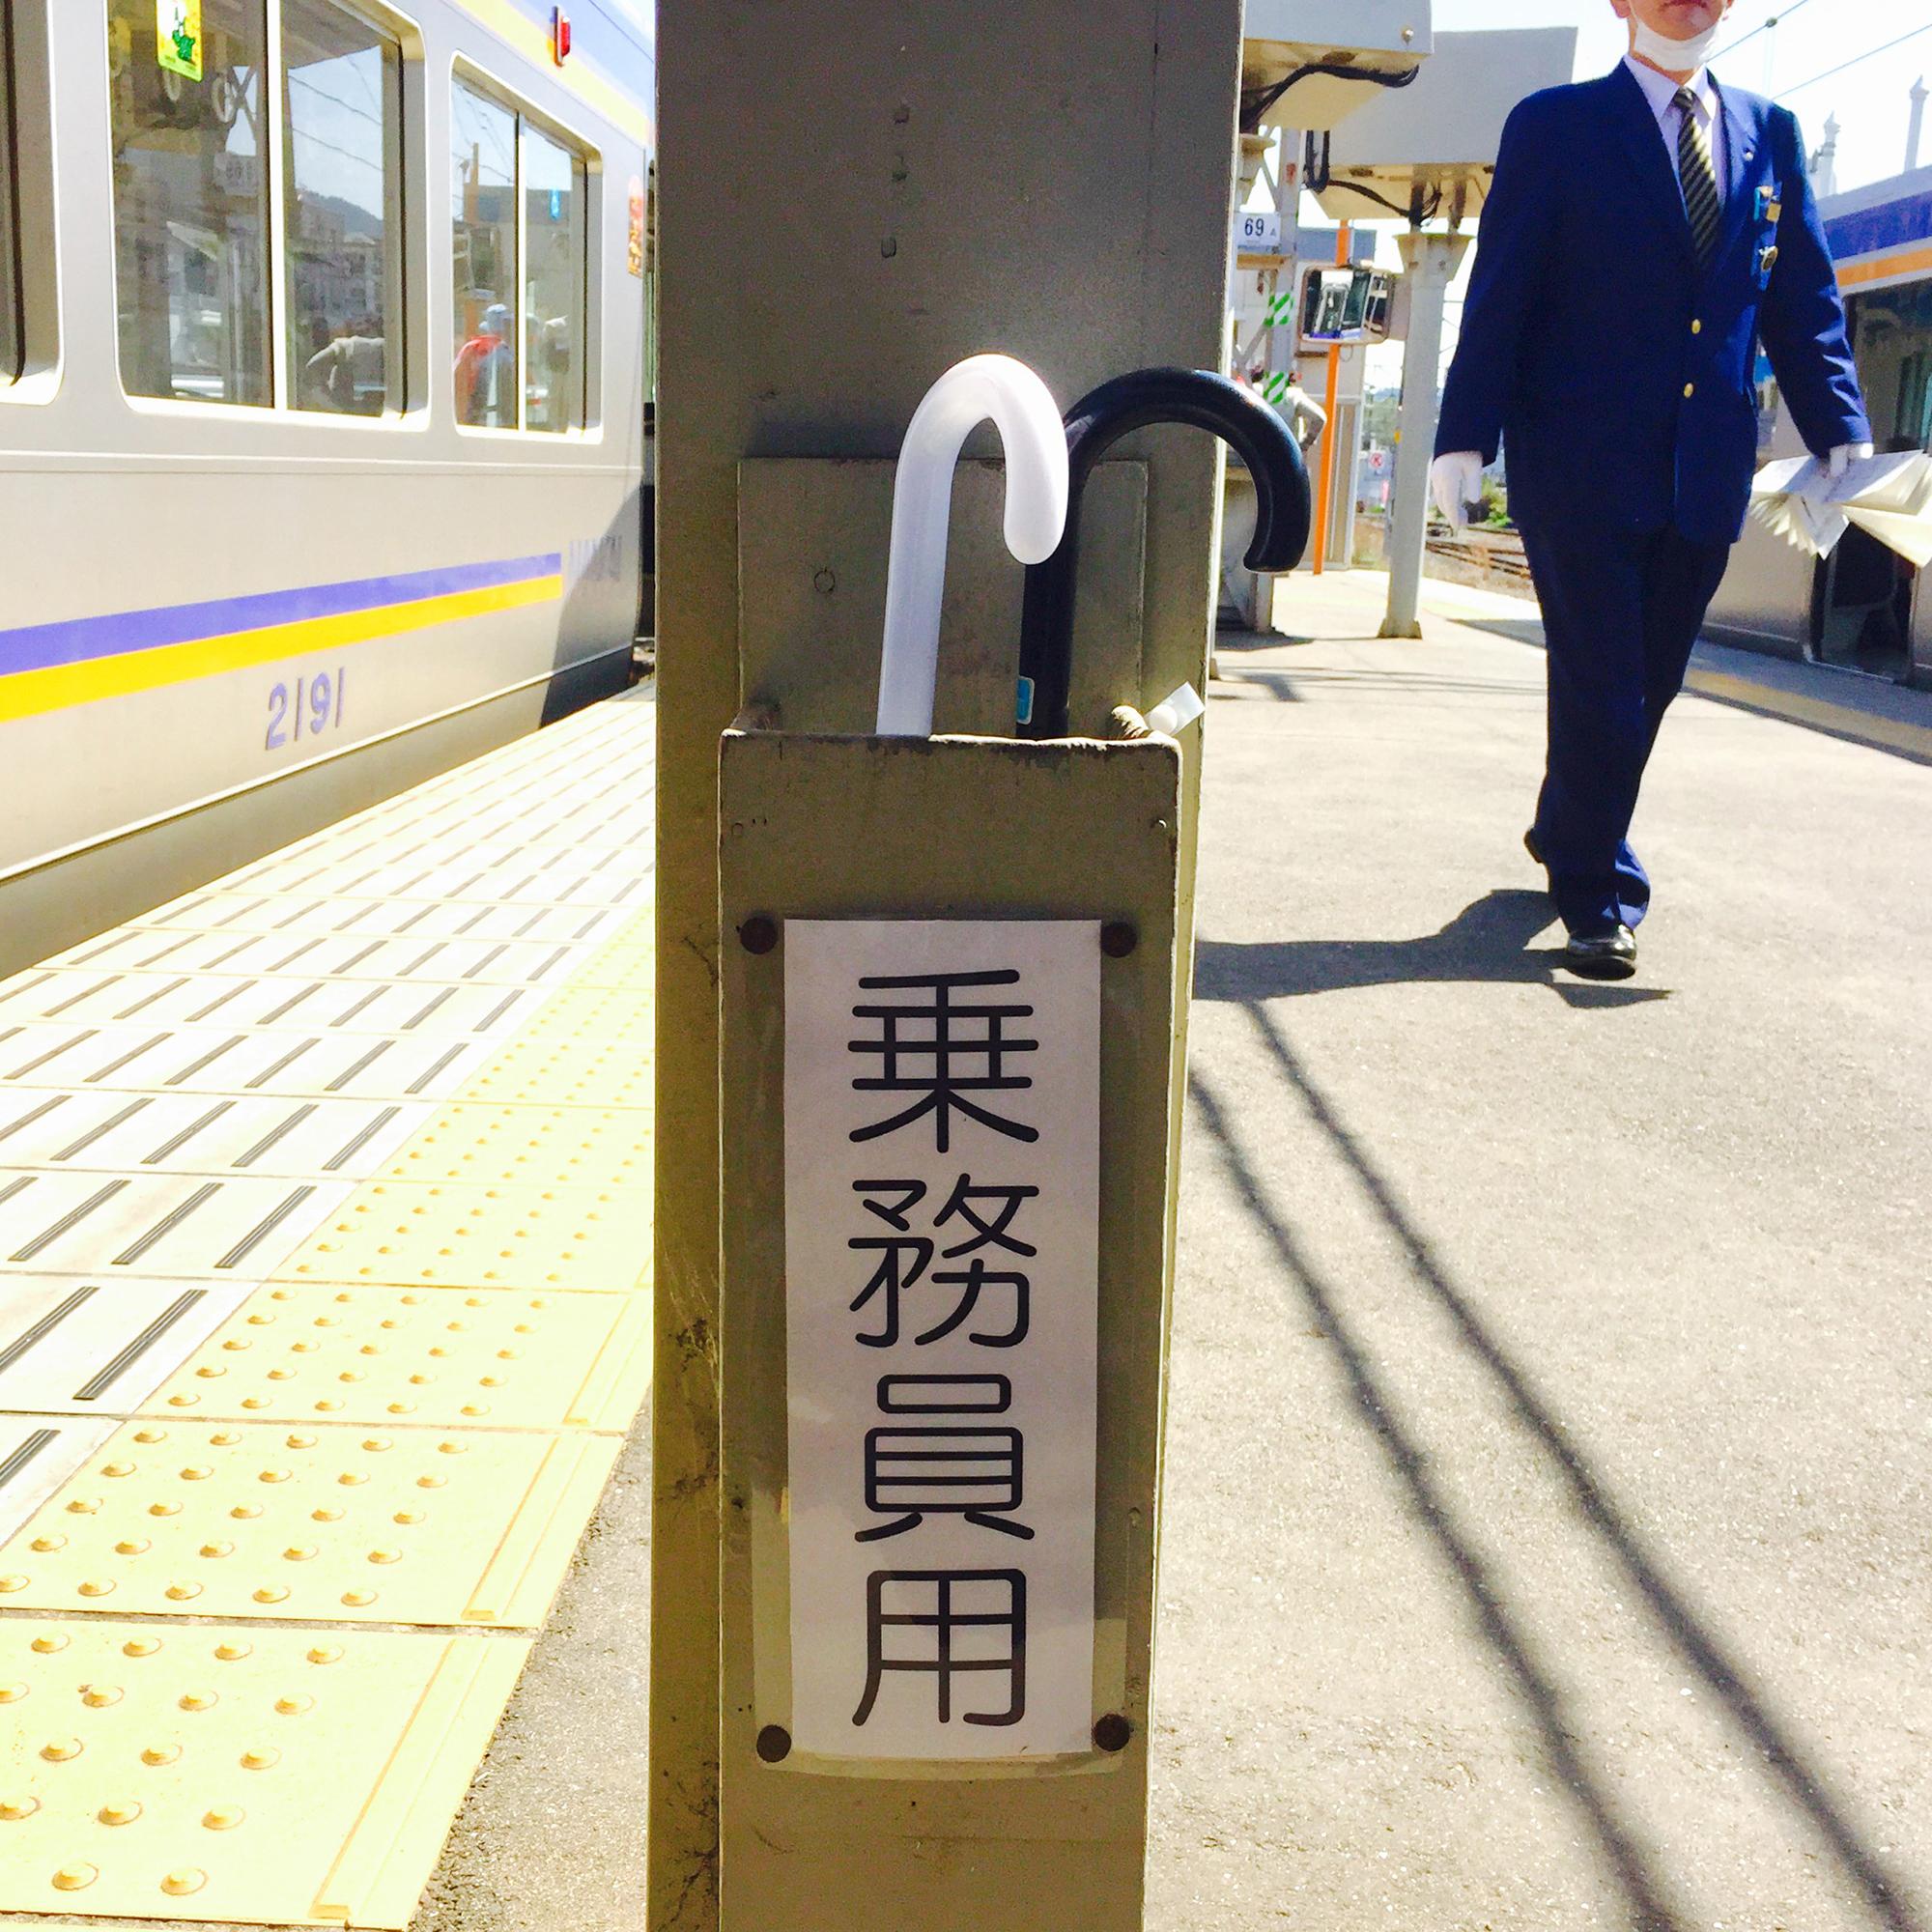 The umbrella-sharing system, Shibukasa.